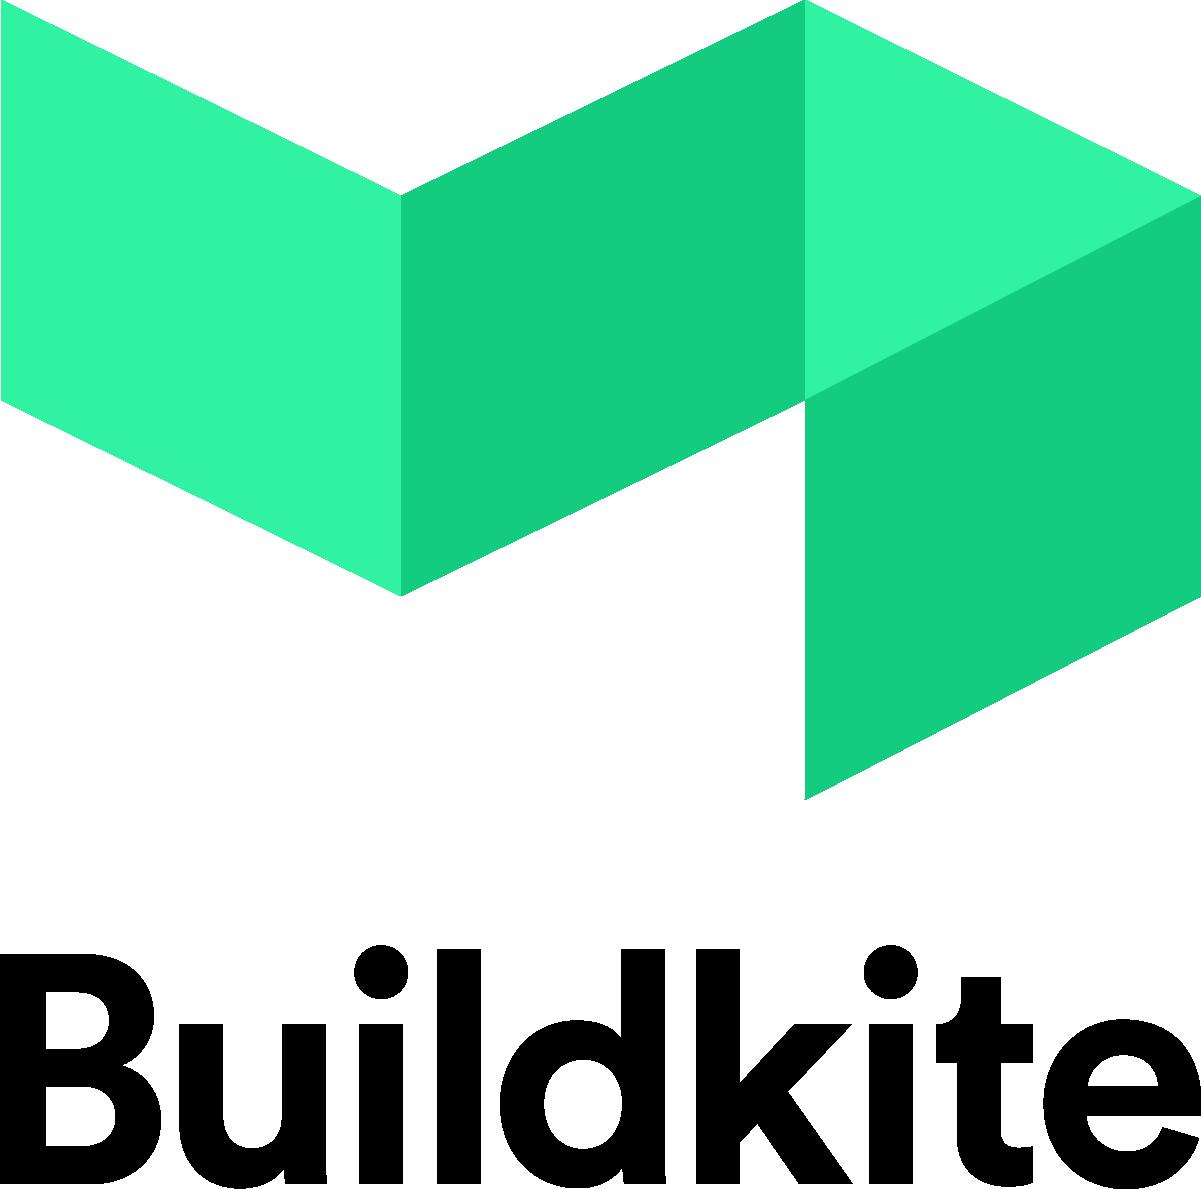 buildkite-logo-portrait-on-light-8b9c0677.png